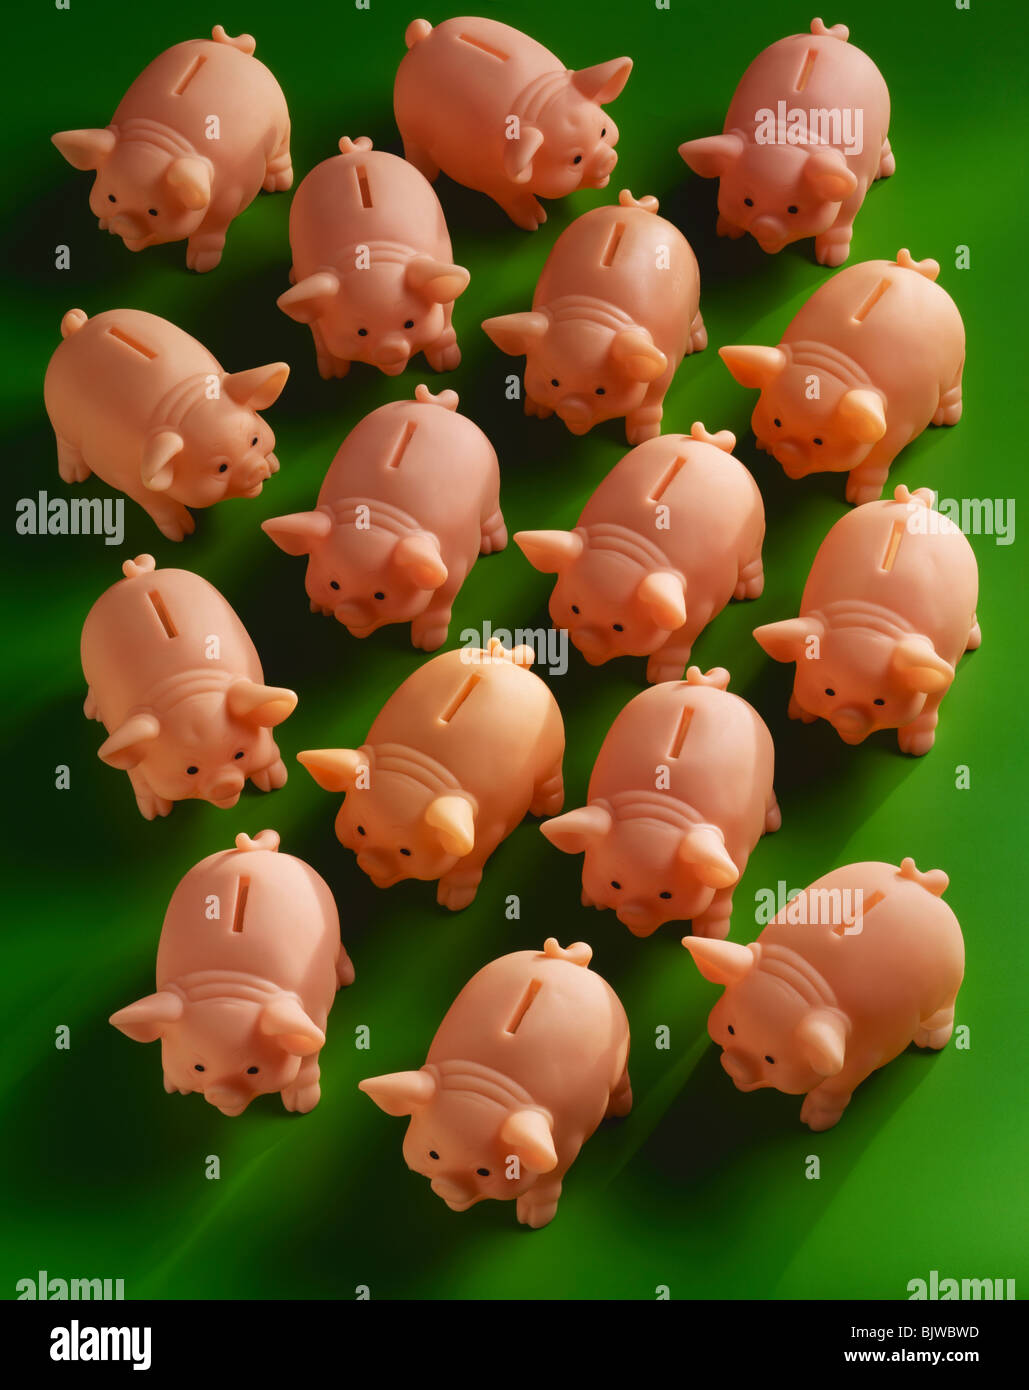 Herd of Piggy Banks - Stock Image